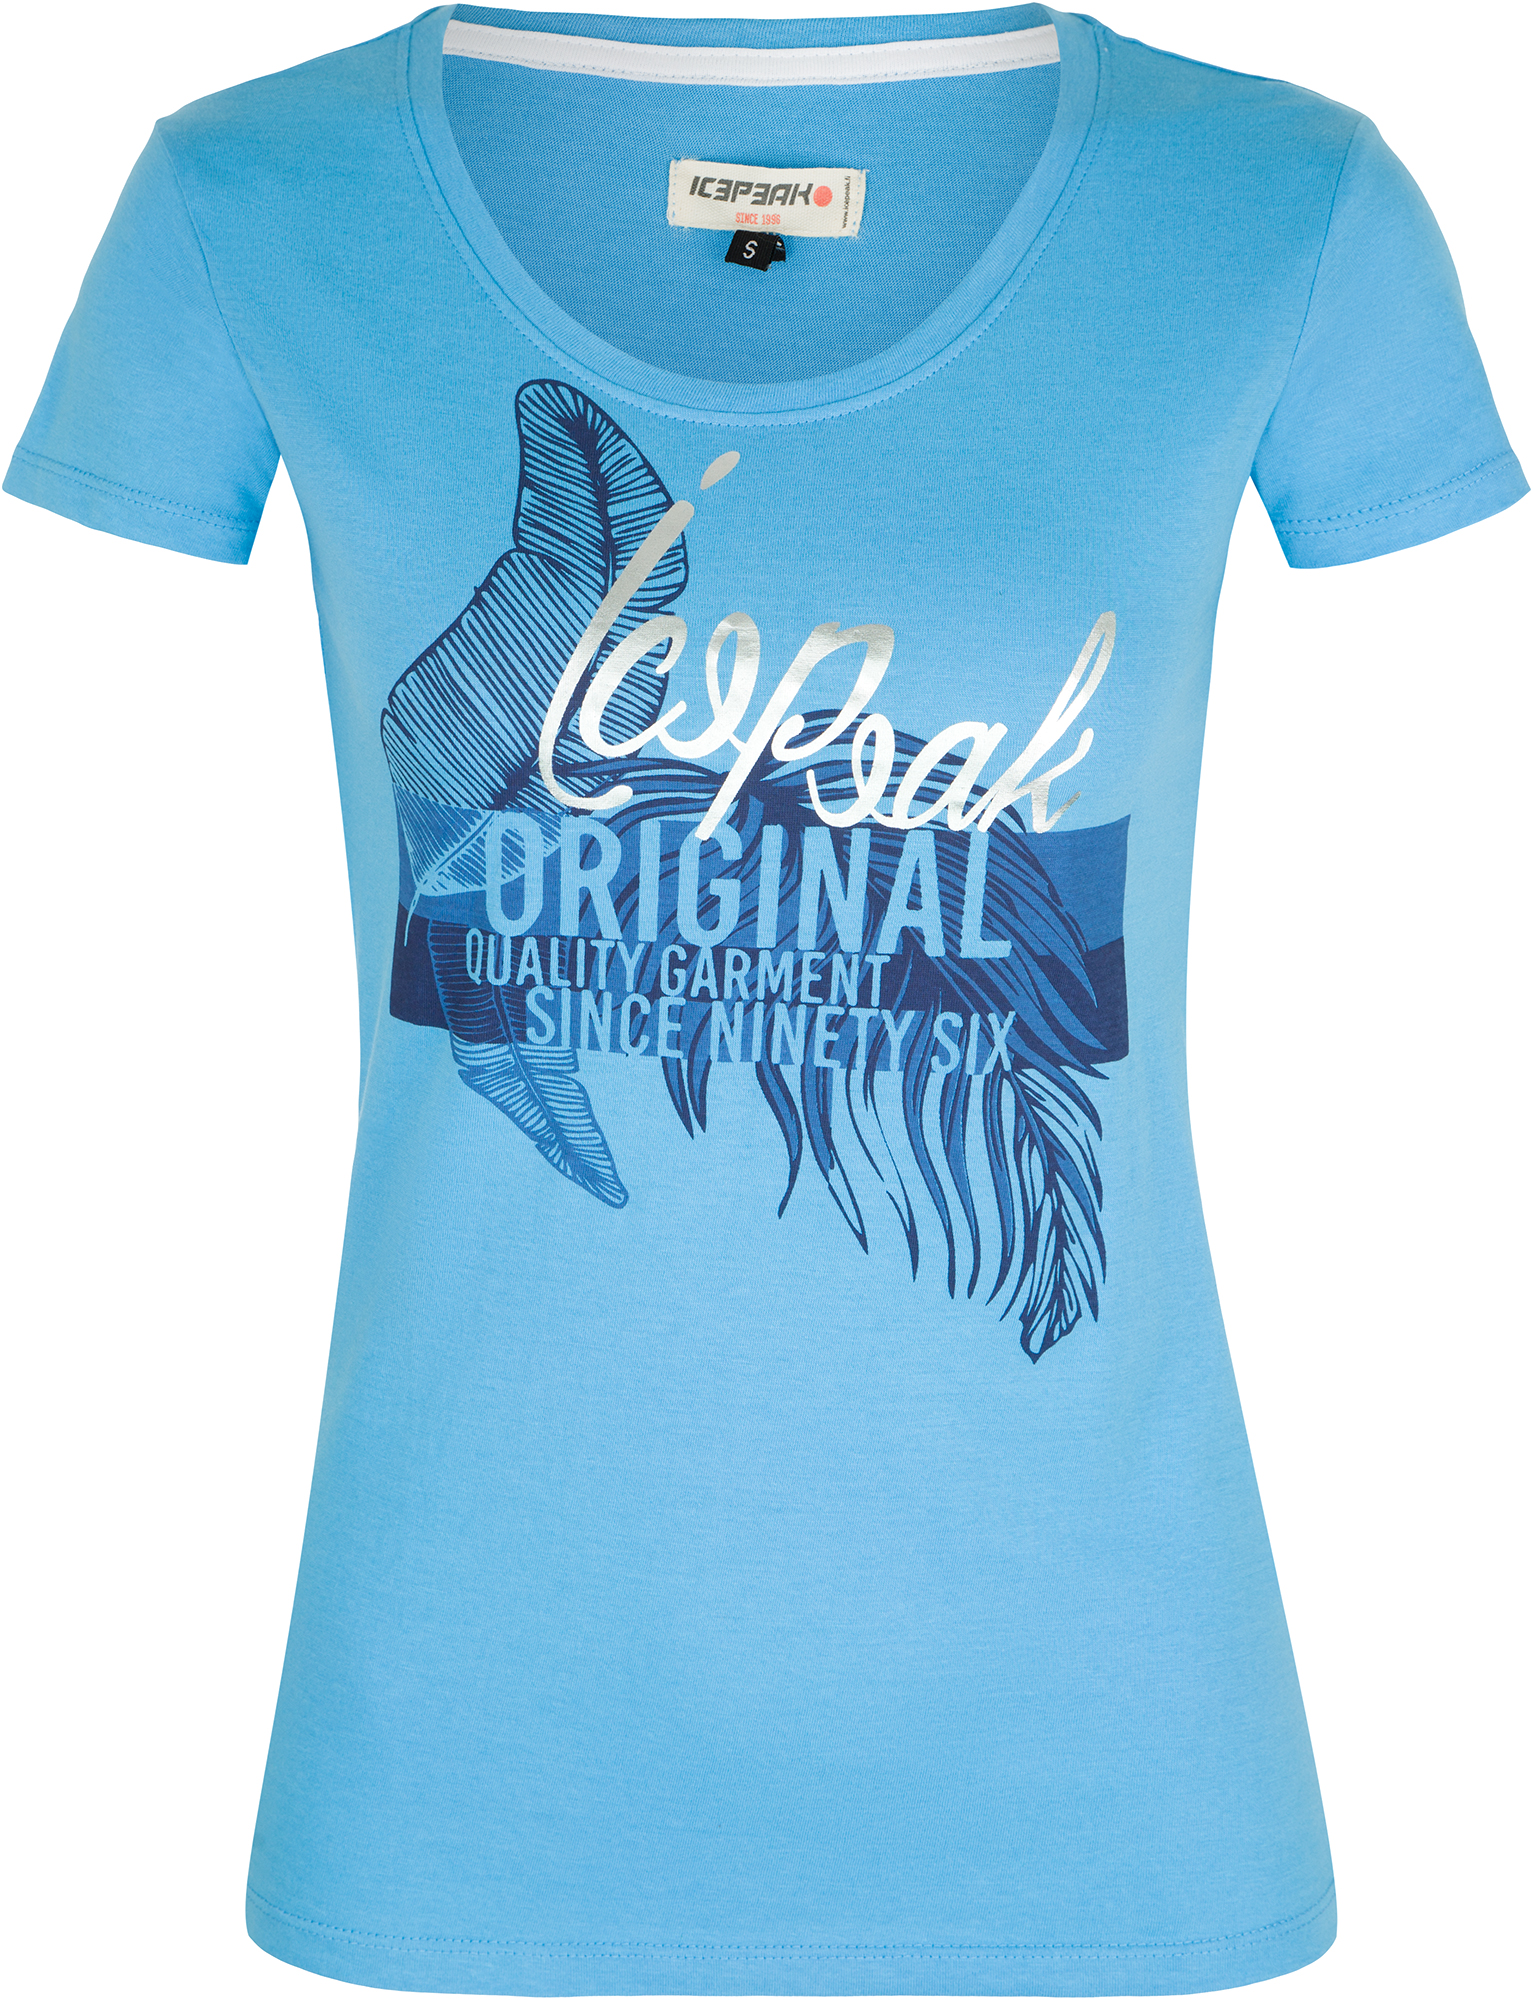 IcePeak Футболка женская IcePeak Mona, размер 50-52 футболка мужская icepeak цвет темно синий 757723689iv 390 размер m 50